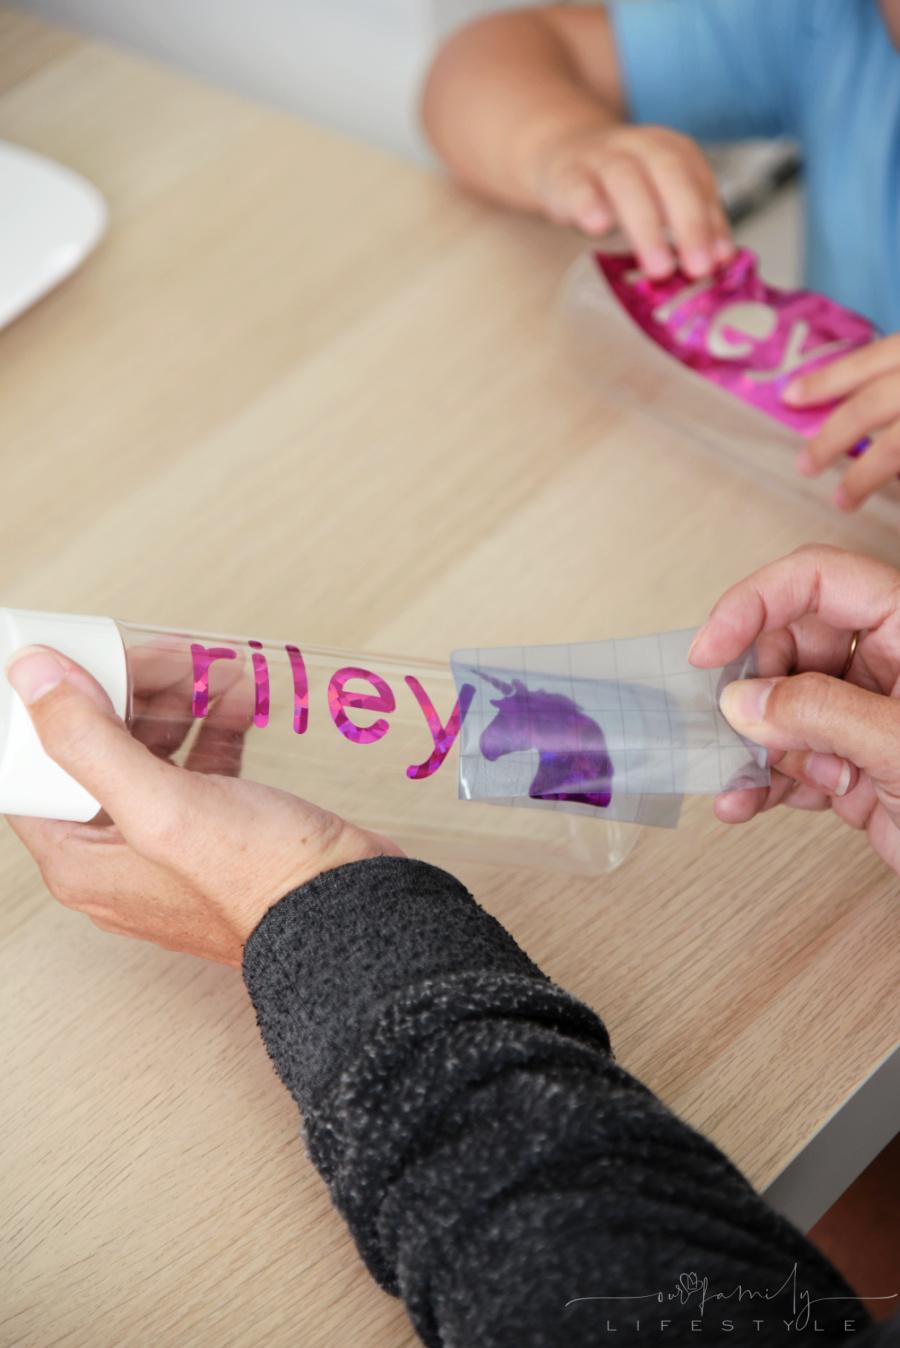 peeling Cricut transfer paper to reveal permanent vinyl on bottle